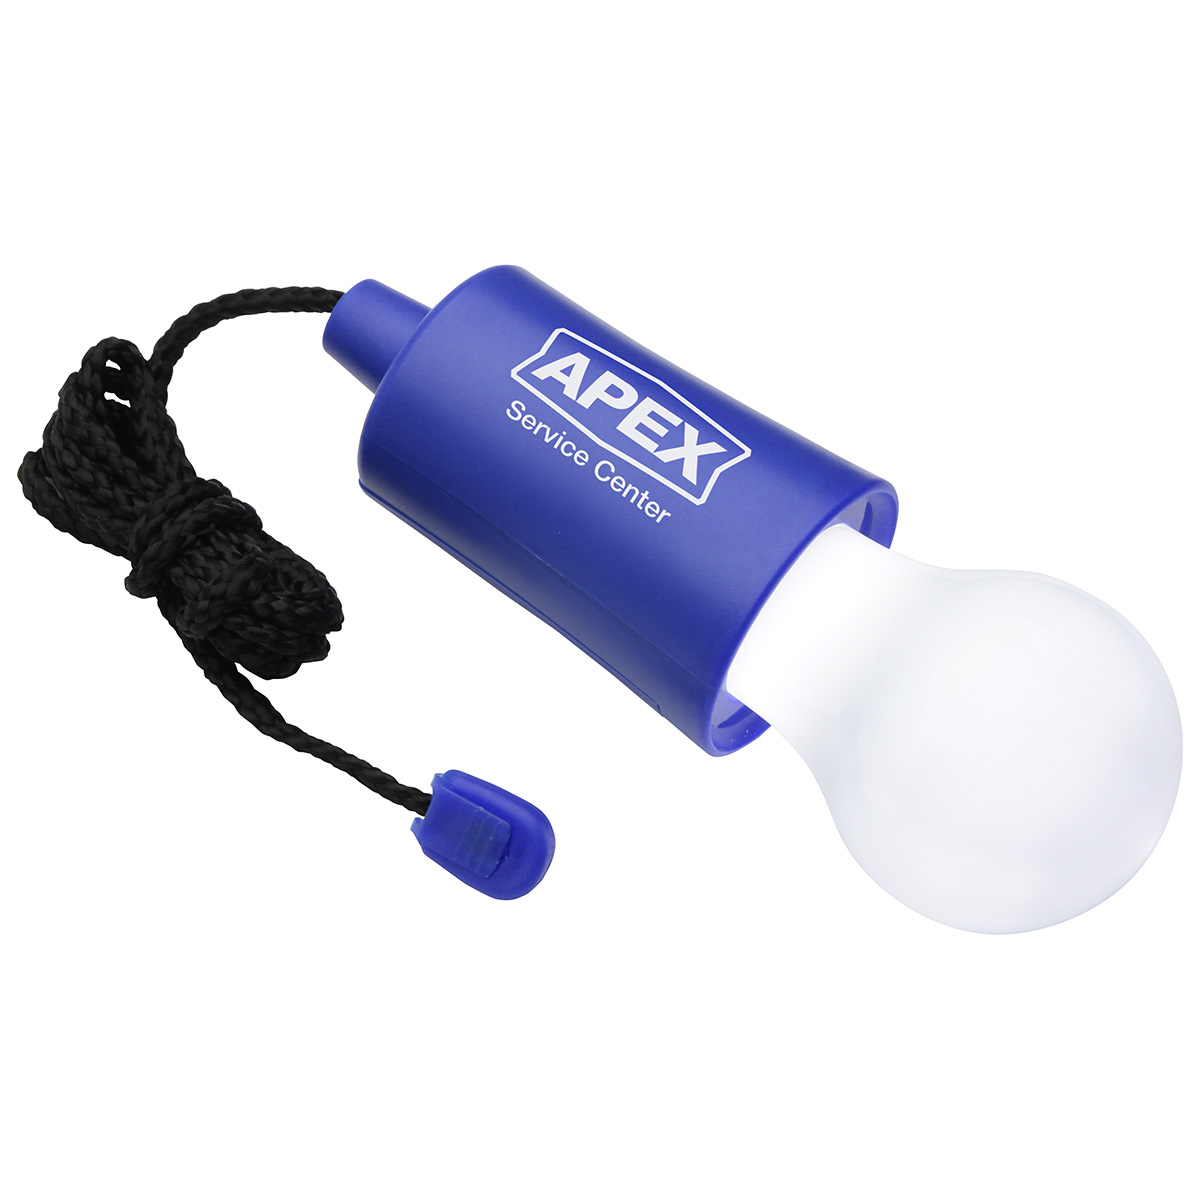 Hang Tight LED Ready Light, WLT-HT16, 1 Colour Imprint